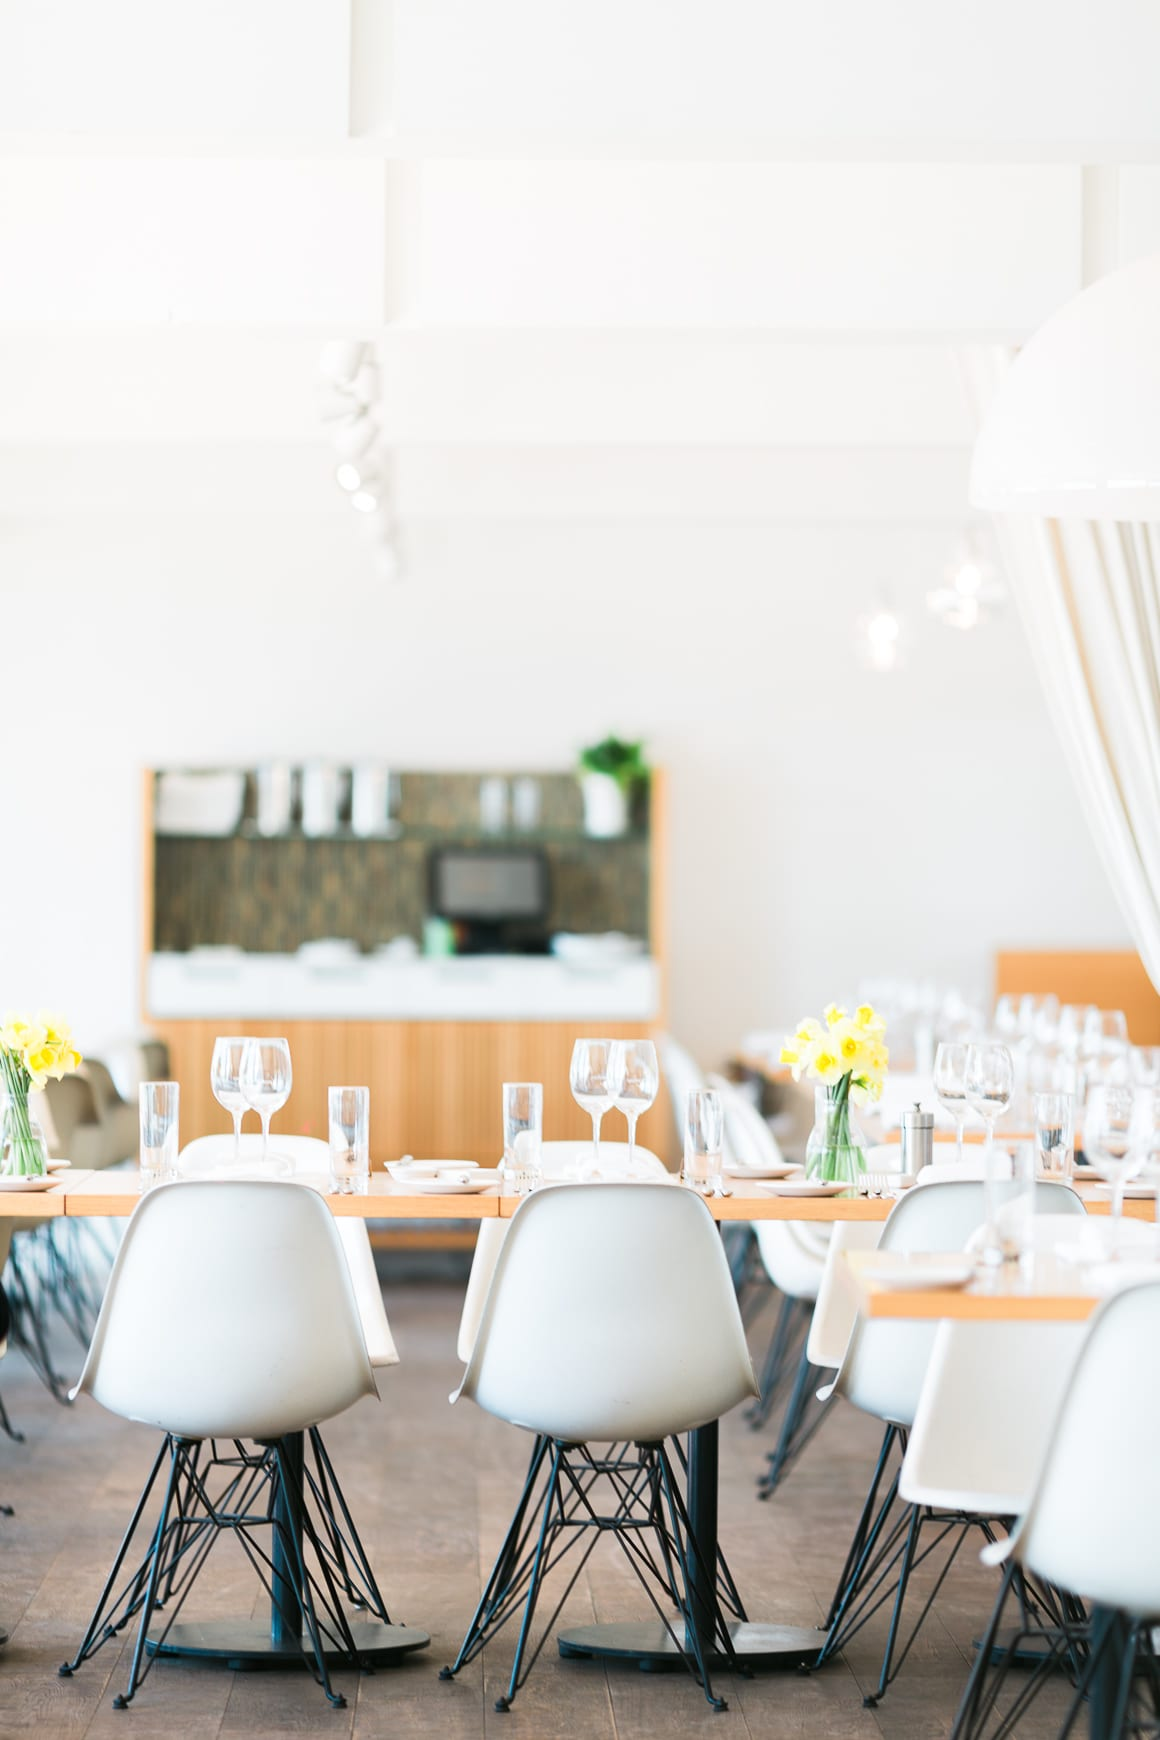 bamoral5 sydney photographer balmoral balmoral public dining room sydney 3. BALMORAL   PUBLIC DINING ROOM   Elin Bandmann Photography